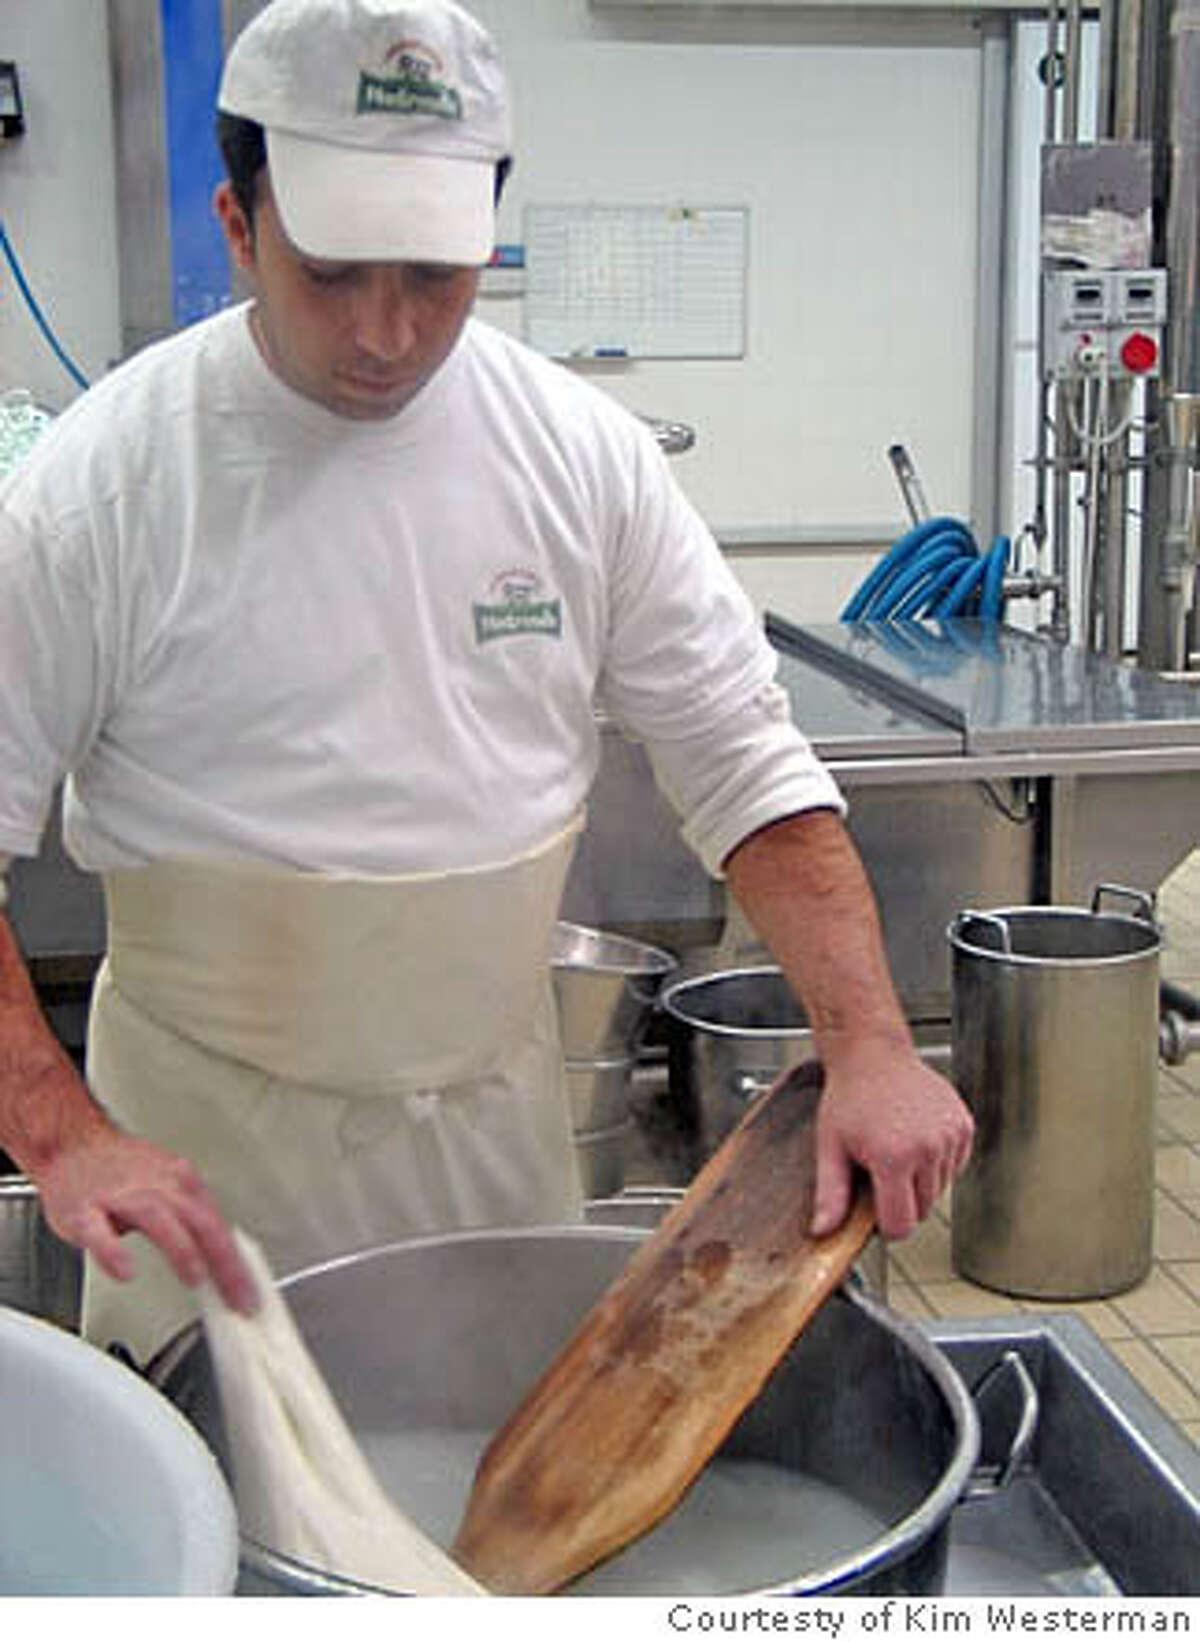 A Puglian cheesemaker stretches fresh mozzarella before shaping it into a pouch to make burrata. Photo courtesy of Kim Westerman